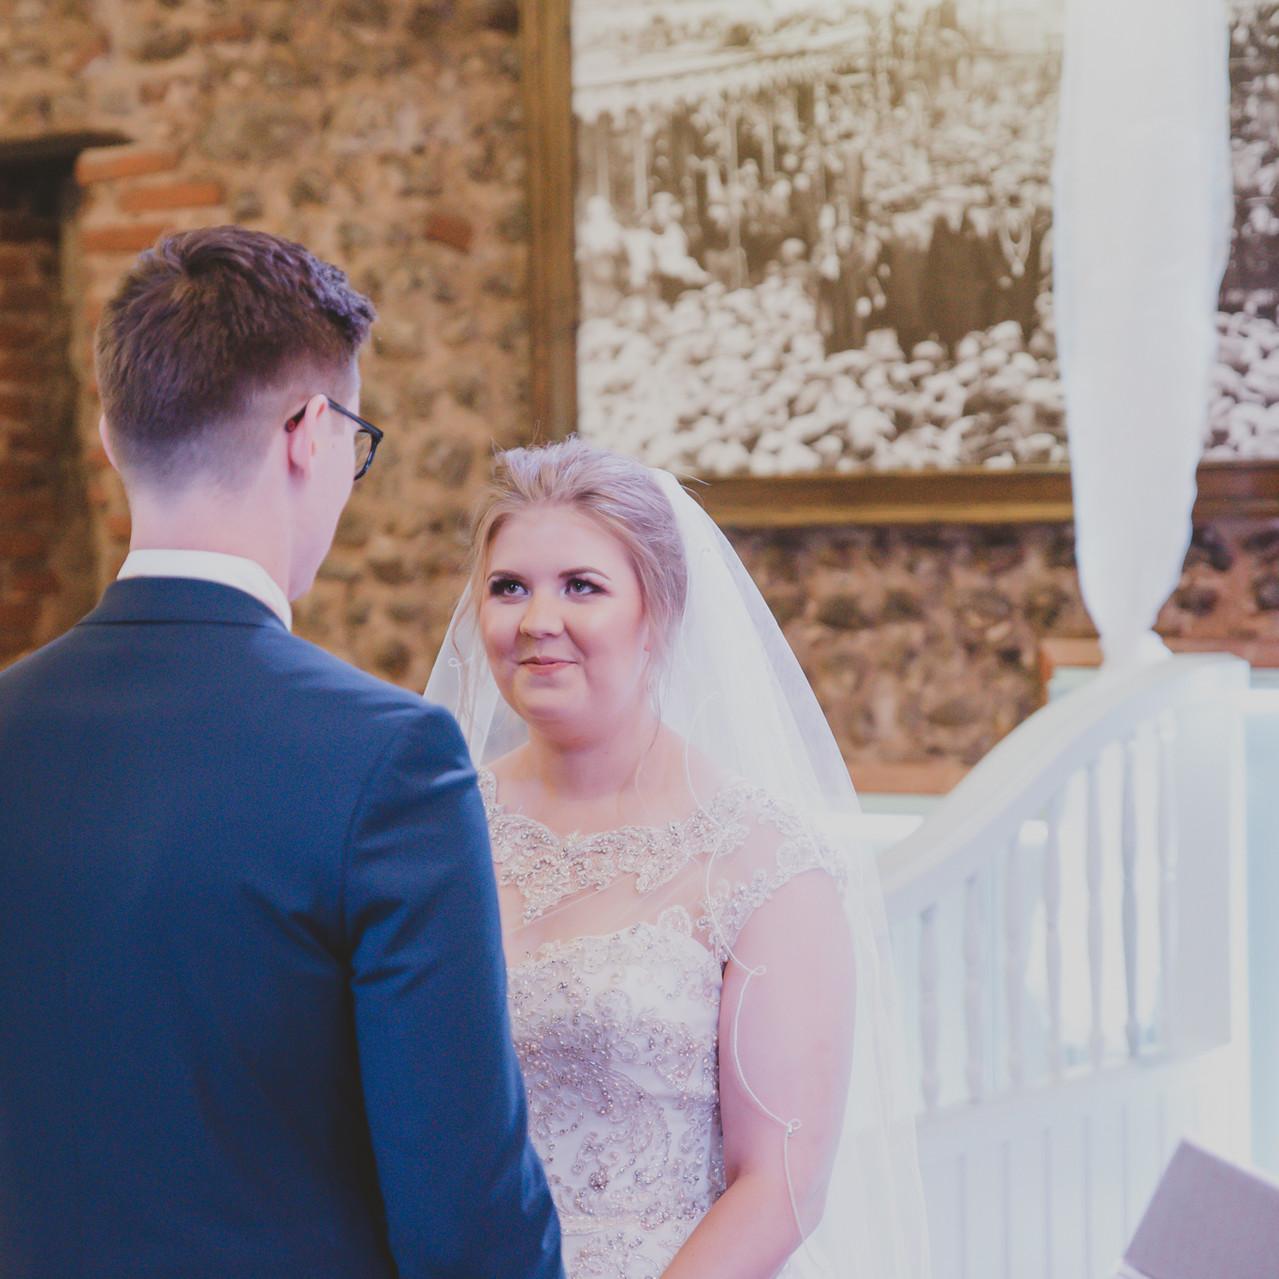 Fay Wedding - Thursford Collection at the Garden Pavilion, Norfolk. The Wedding